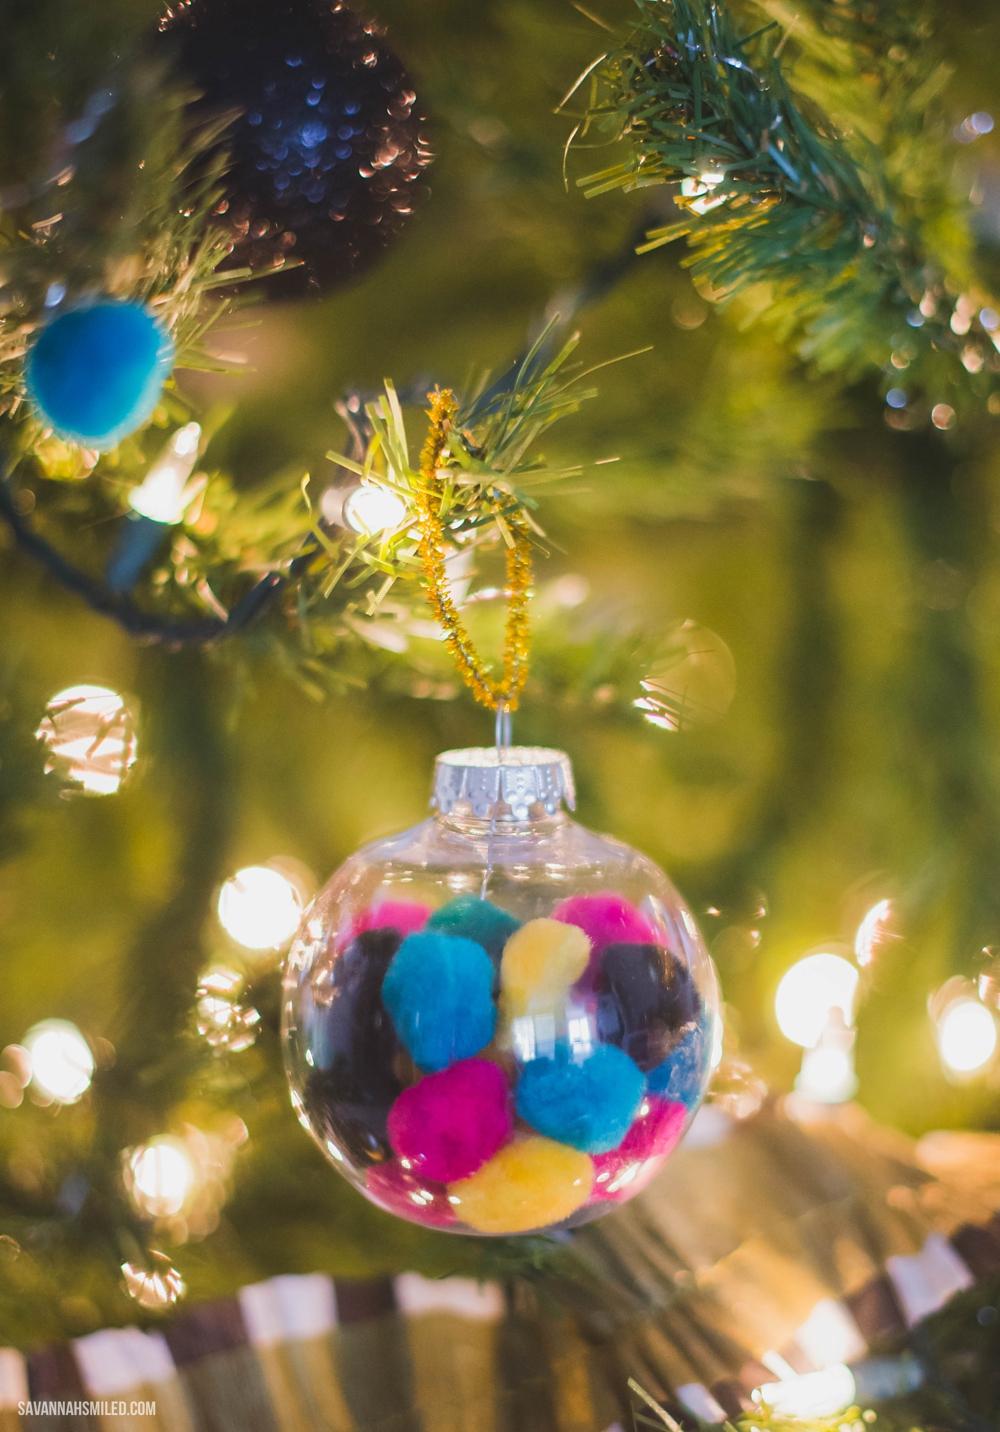 fuzzy-balls-christmas-ornament-craft-5.jpg